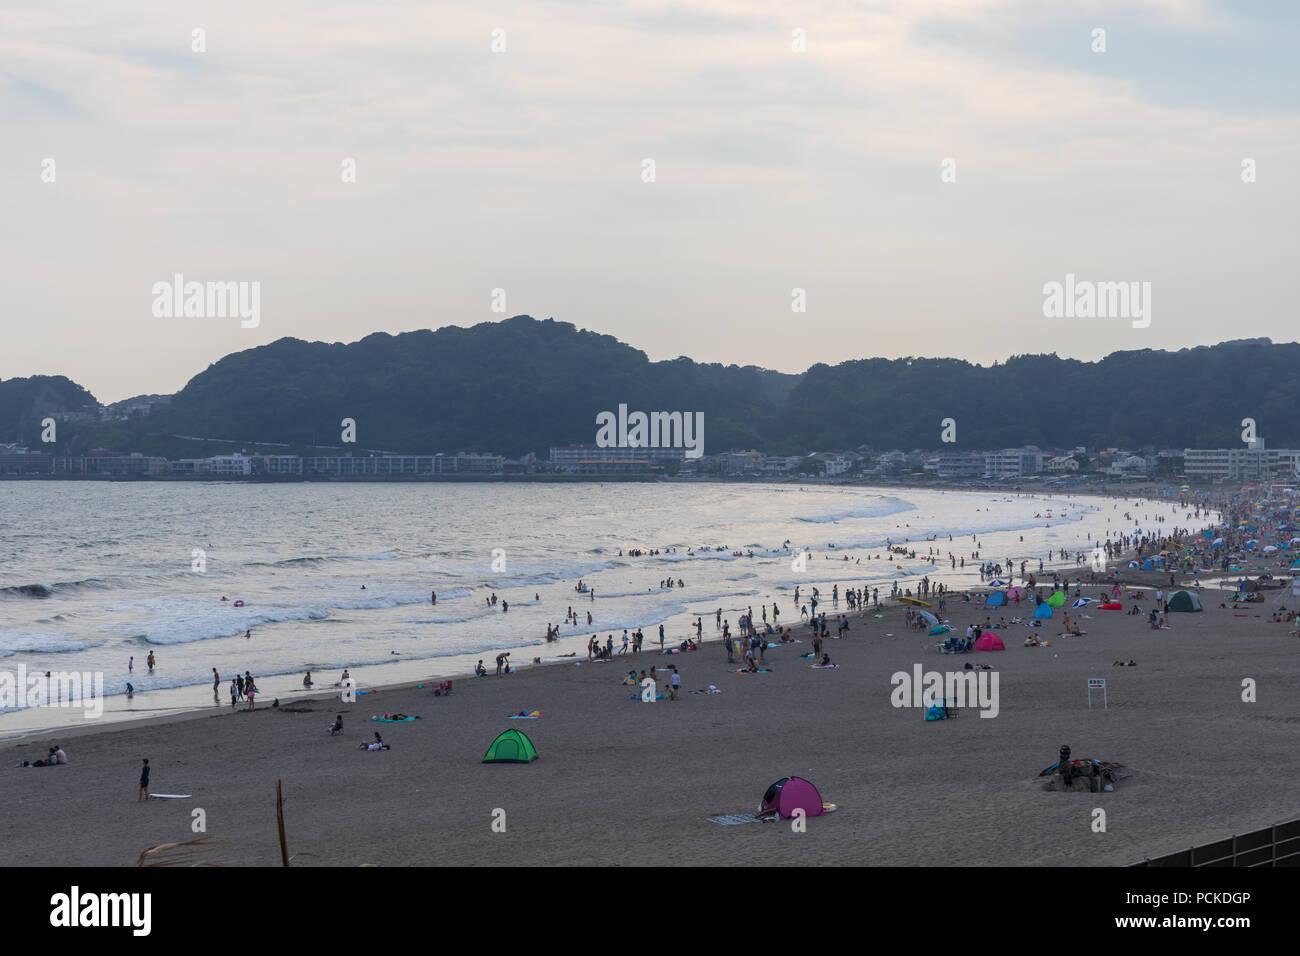 Yuigahama Beach and Kamakura Zaimokuza Beach, early evening; Kamakura, Kanagawa Prefecture, Japan - Stock Image